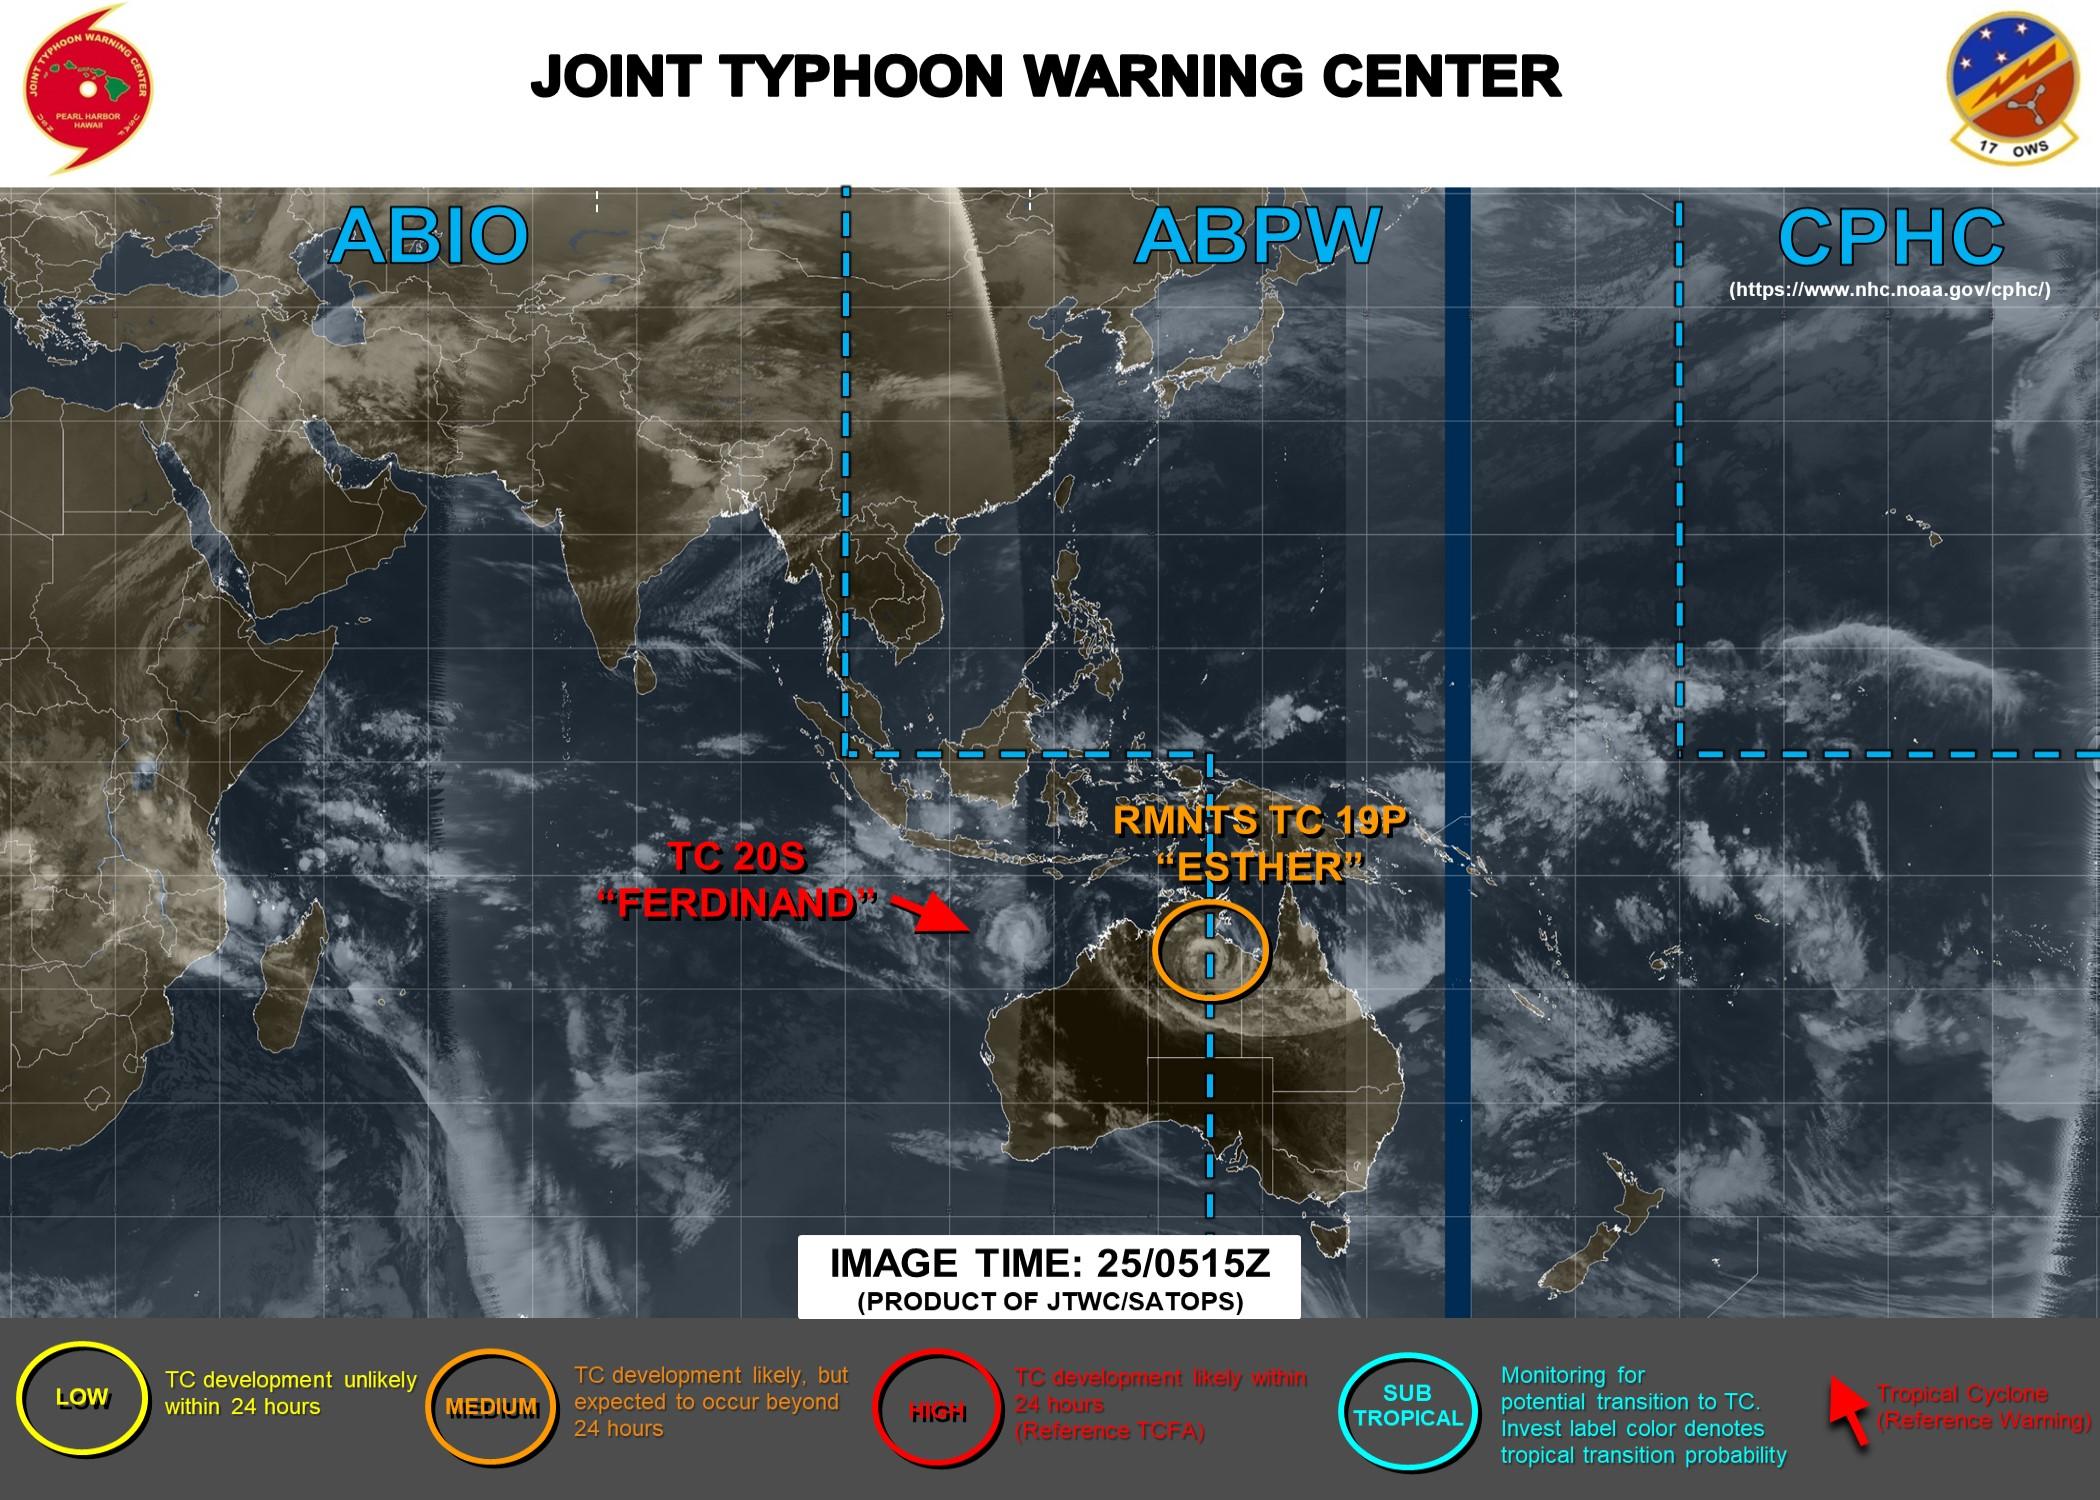 TC 20S(FERDINAND): CAT 2 US and intensifying. 19P(ESTHER): over-land, 25/09UTC update